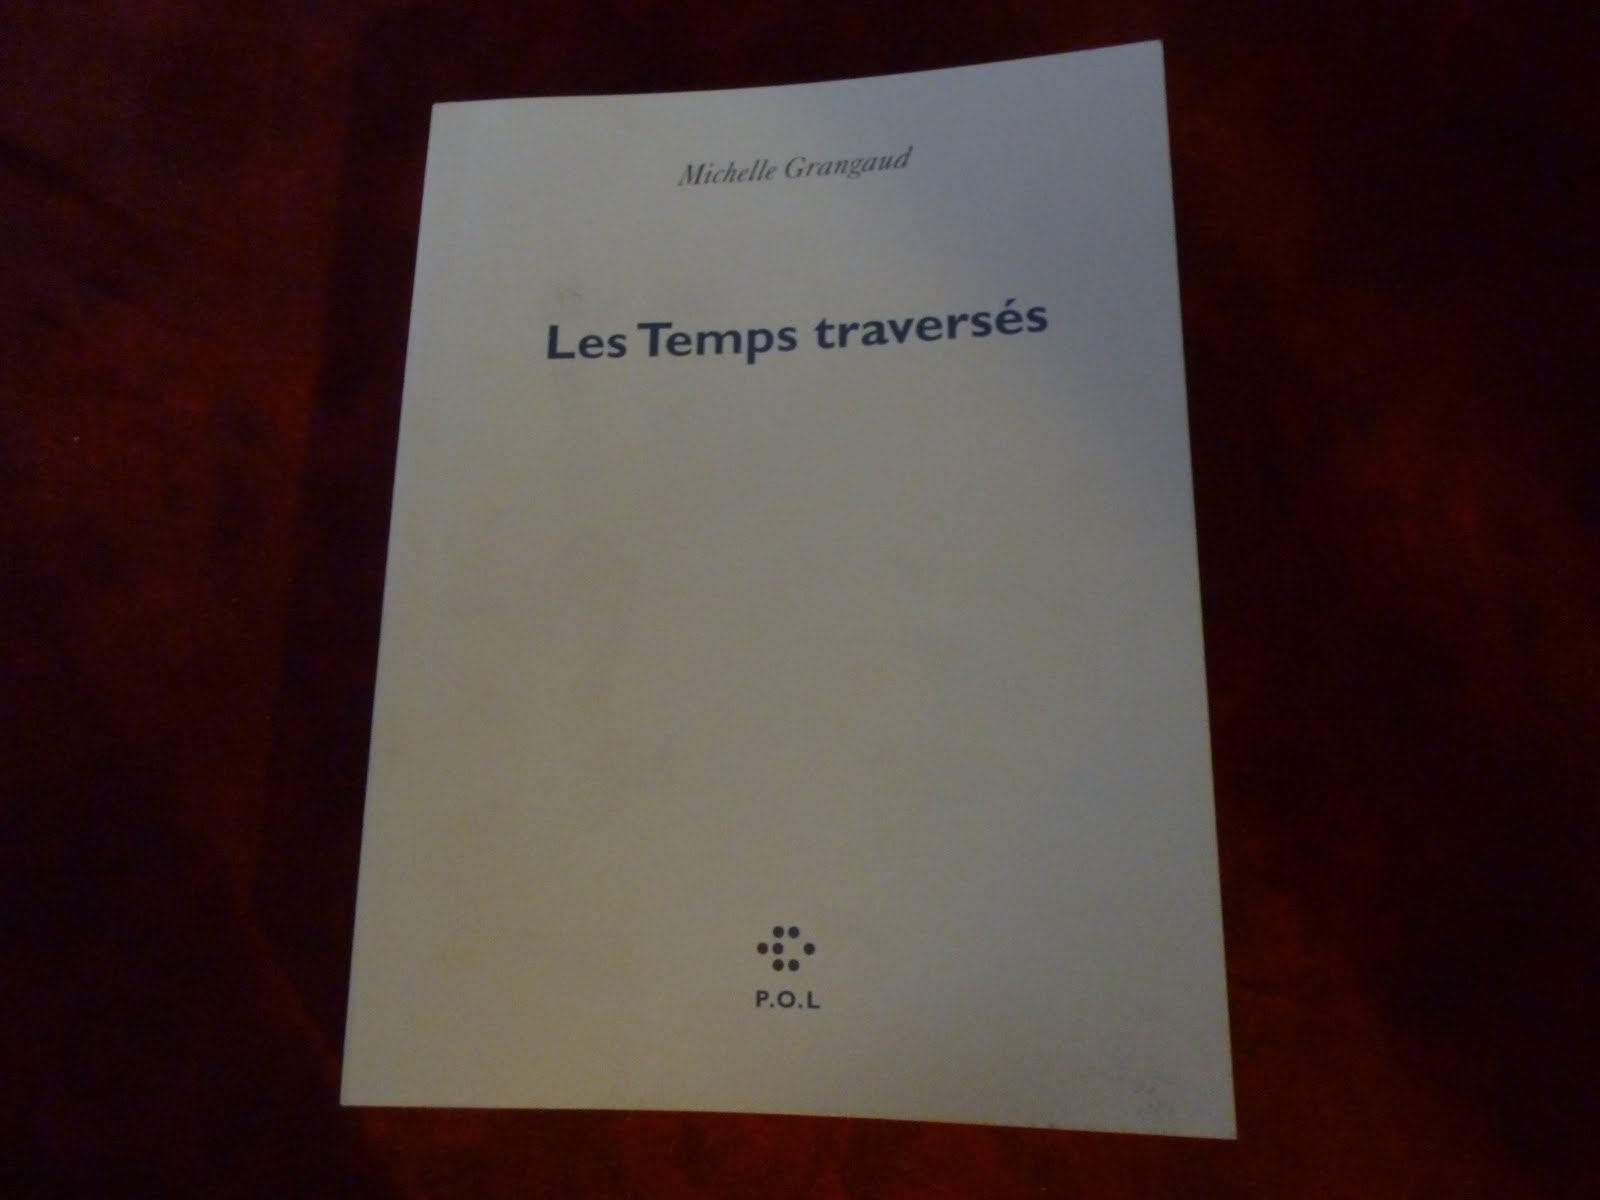 topos rencontre amoureuse littérature.